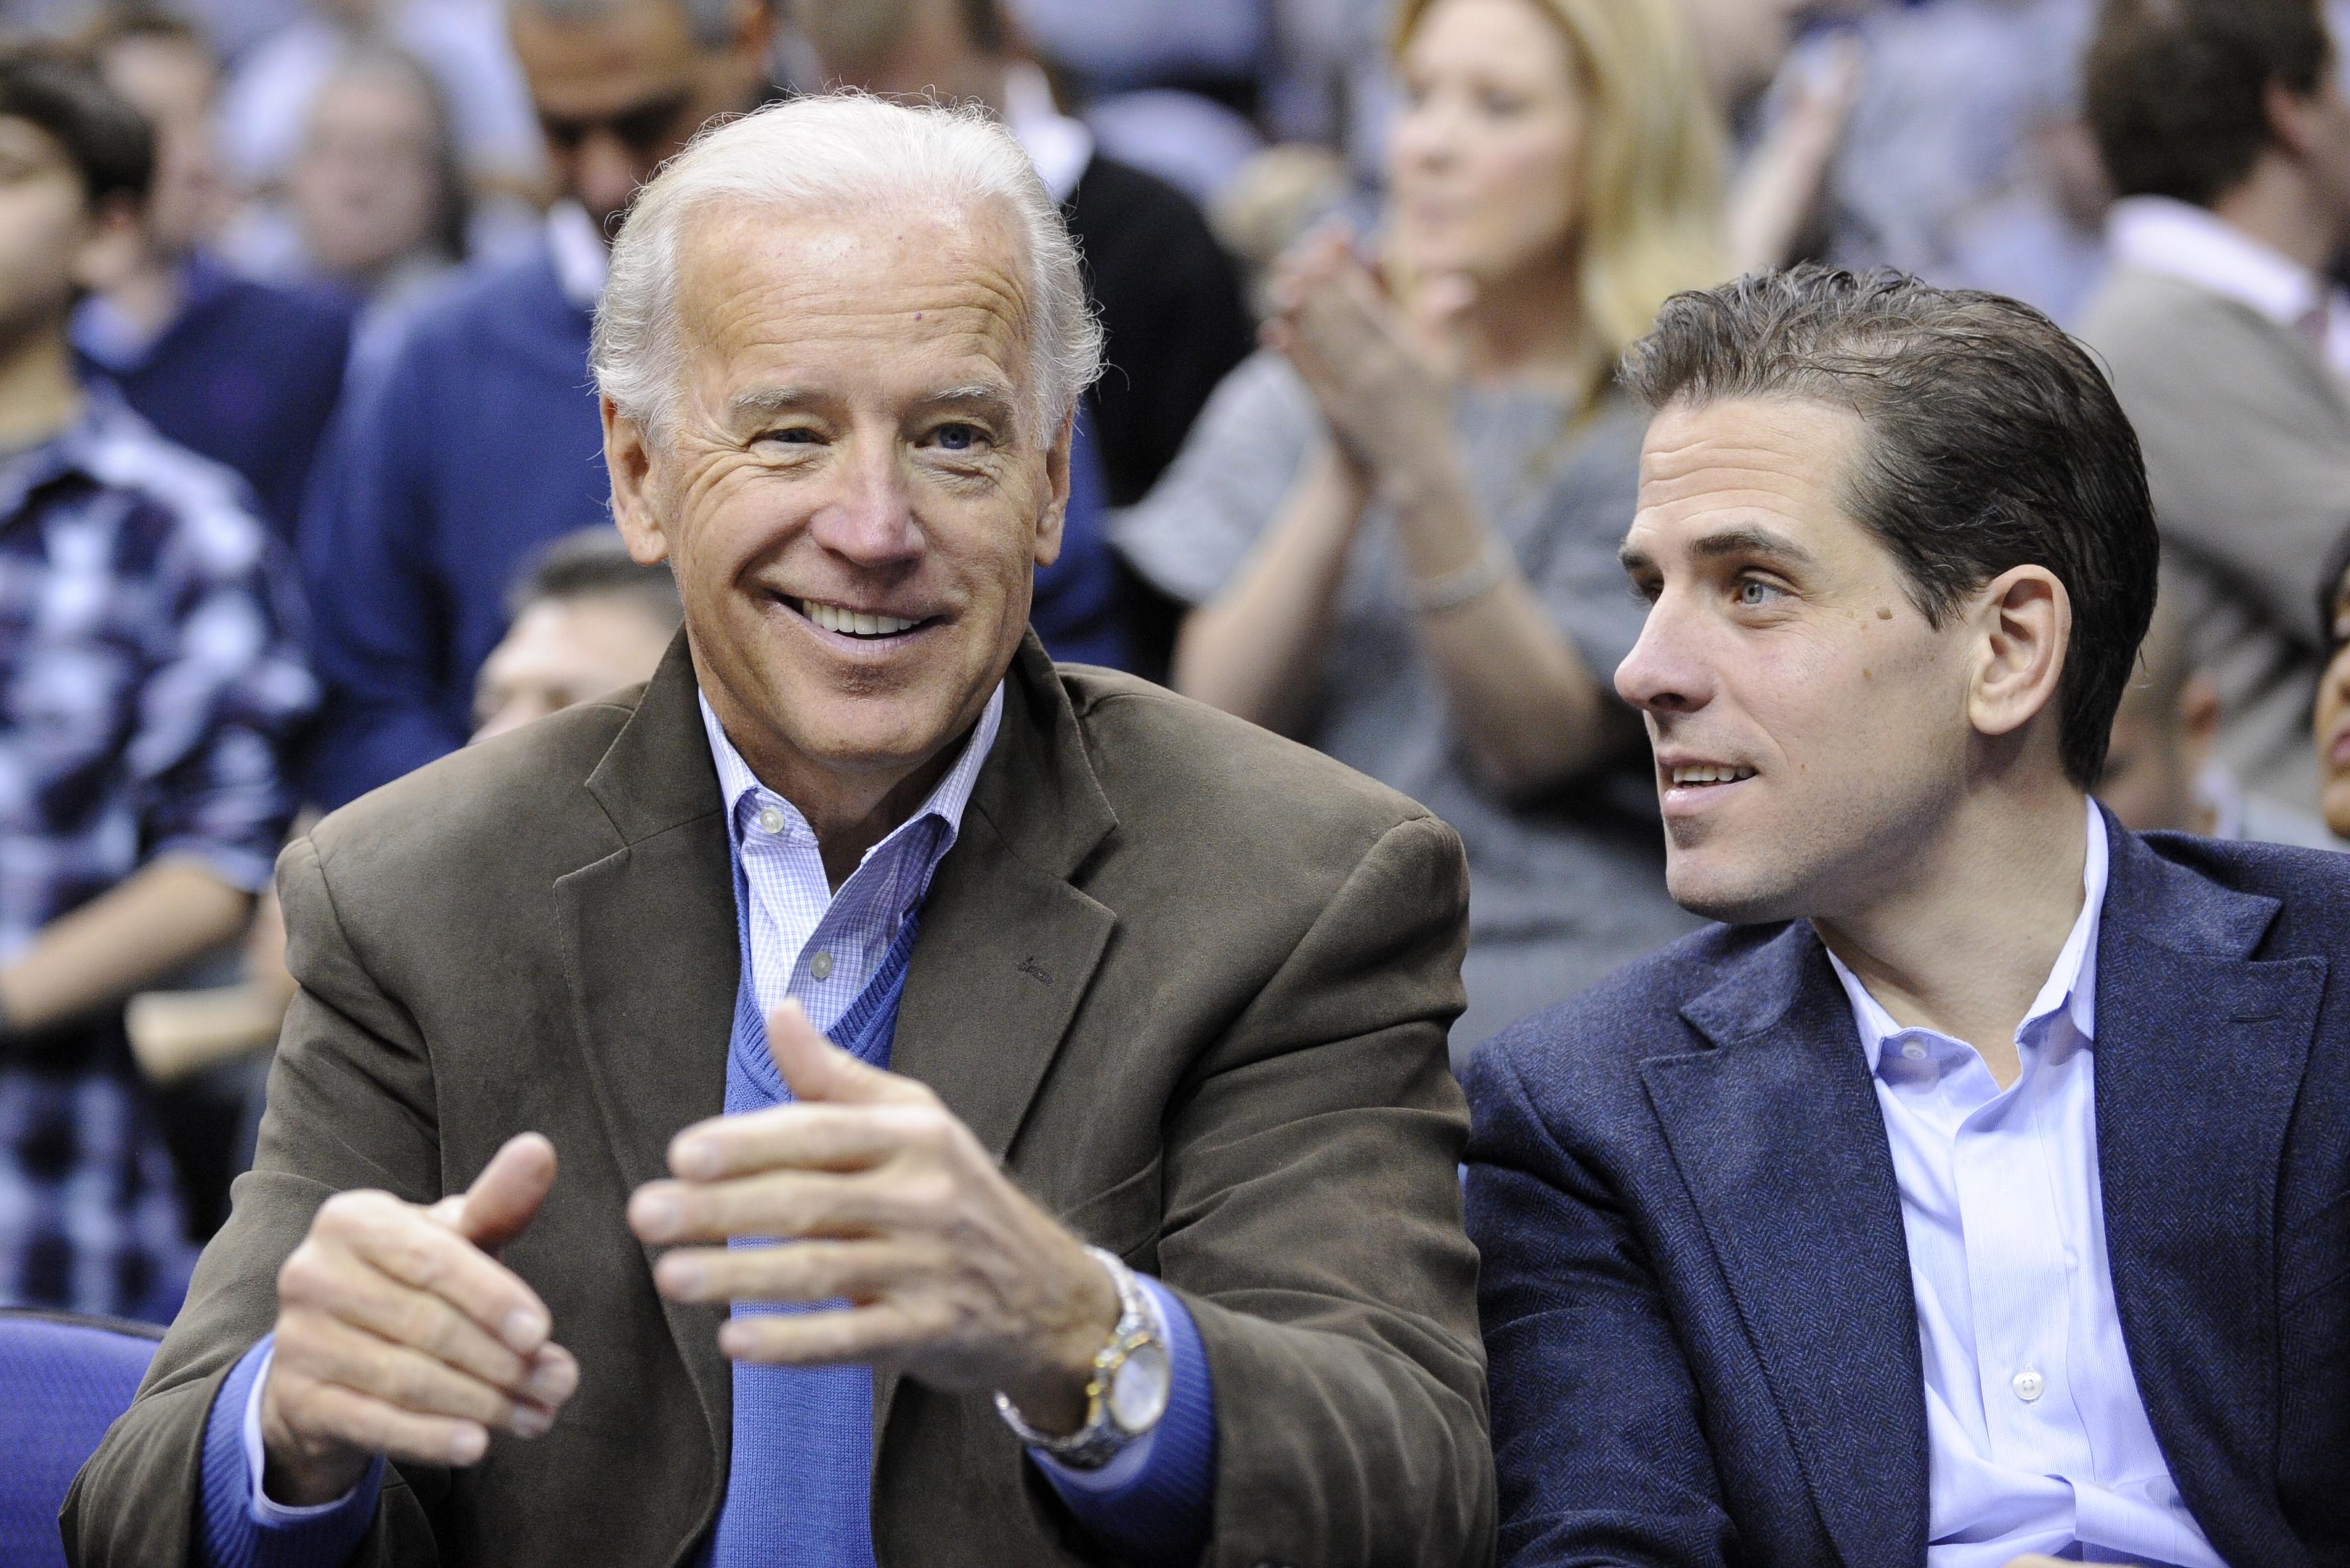 It S Fair To Question Hunter Biden S Business Dealings The Boston Globe